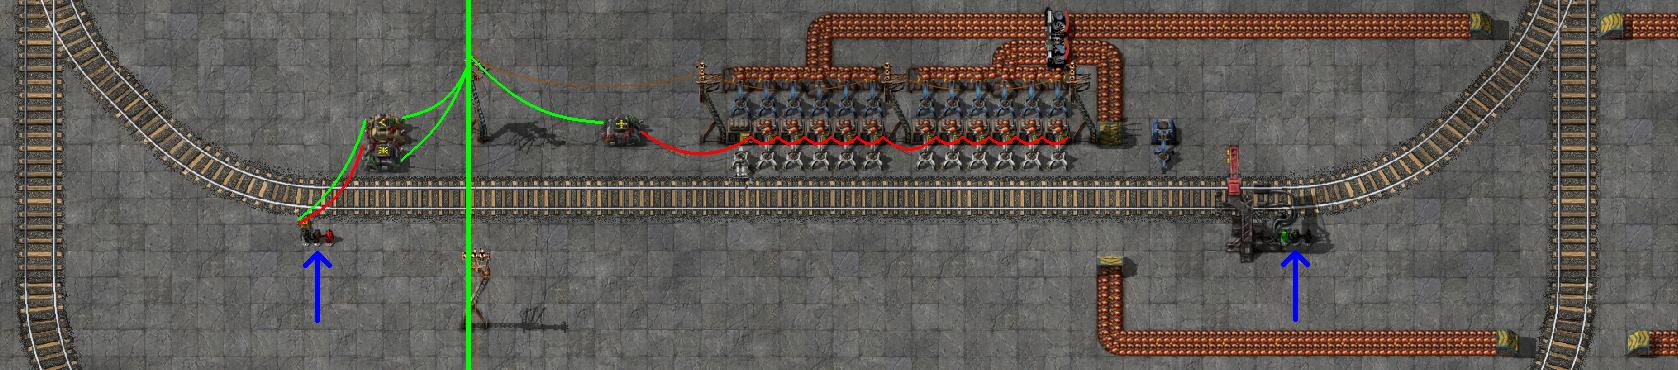 Factorio: Train Balancer | Green Lightning